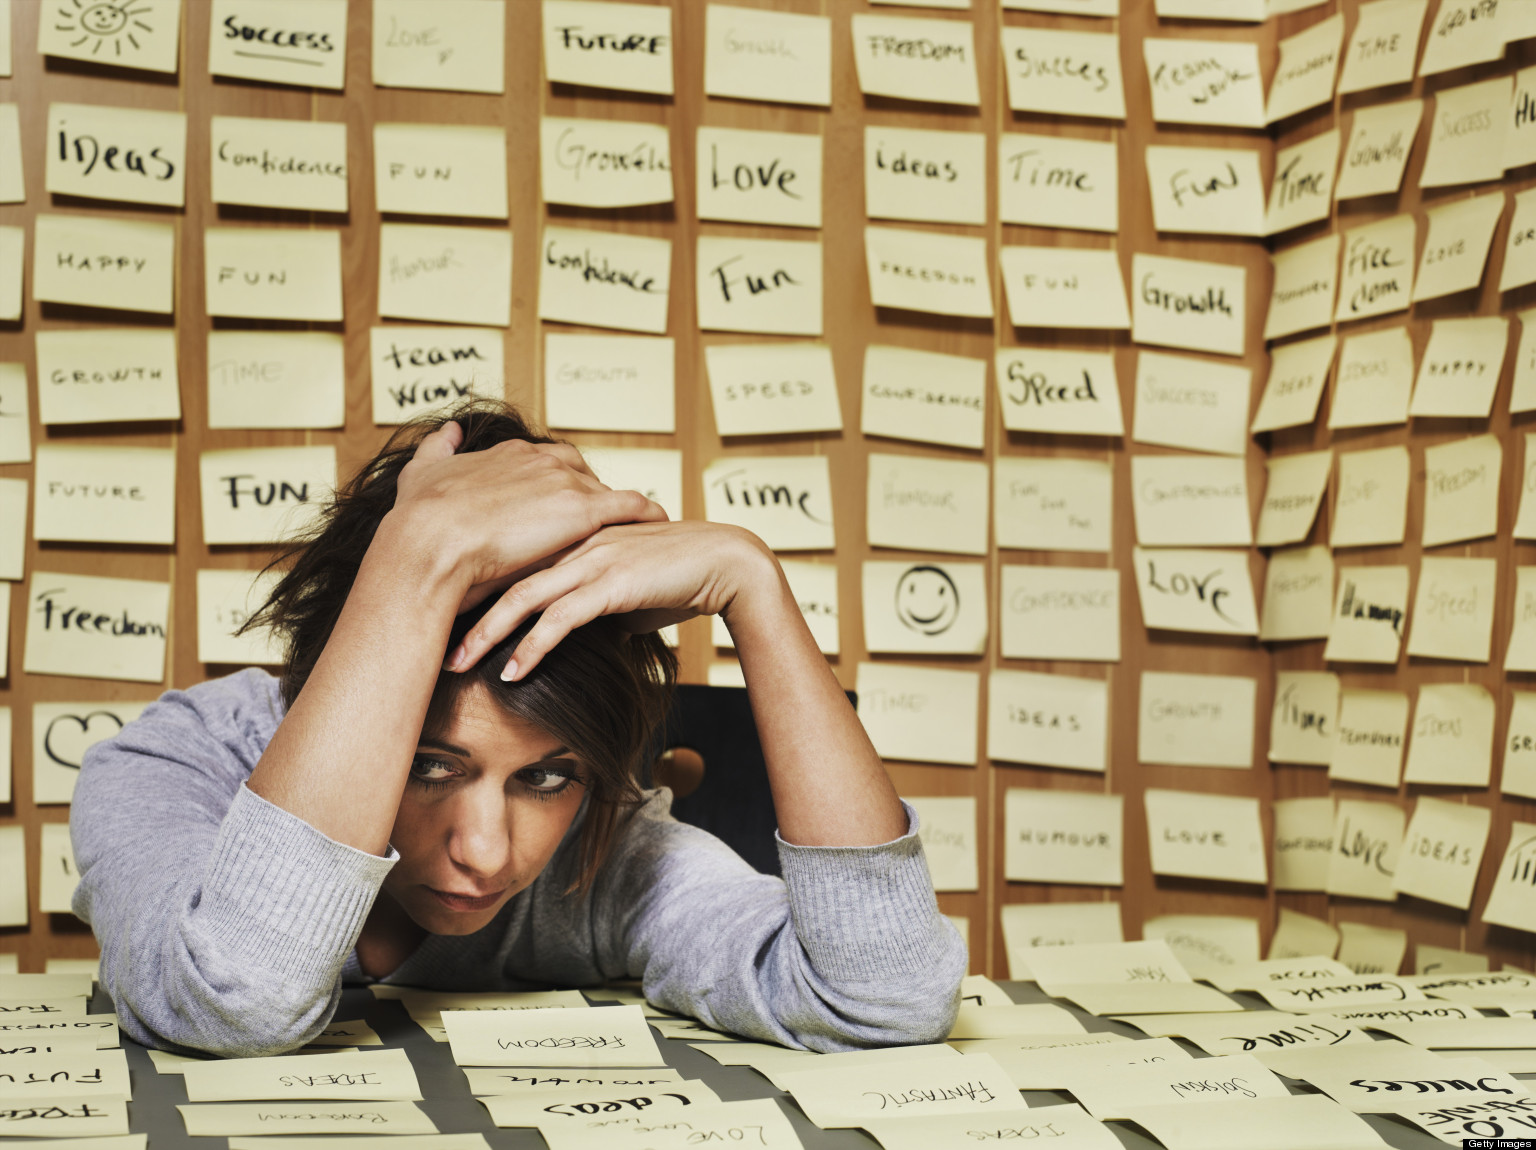 stress at work essay the book essay the book essay odol ip book  stress at work essay handlungsreisender beispiel essay